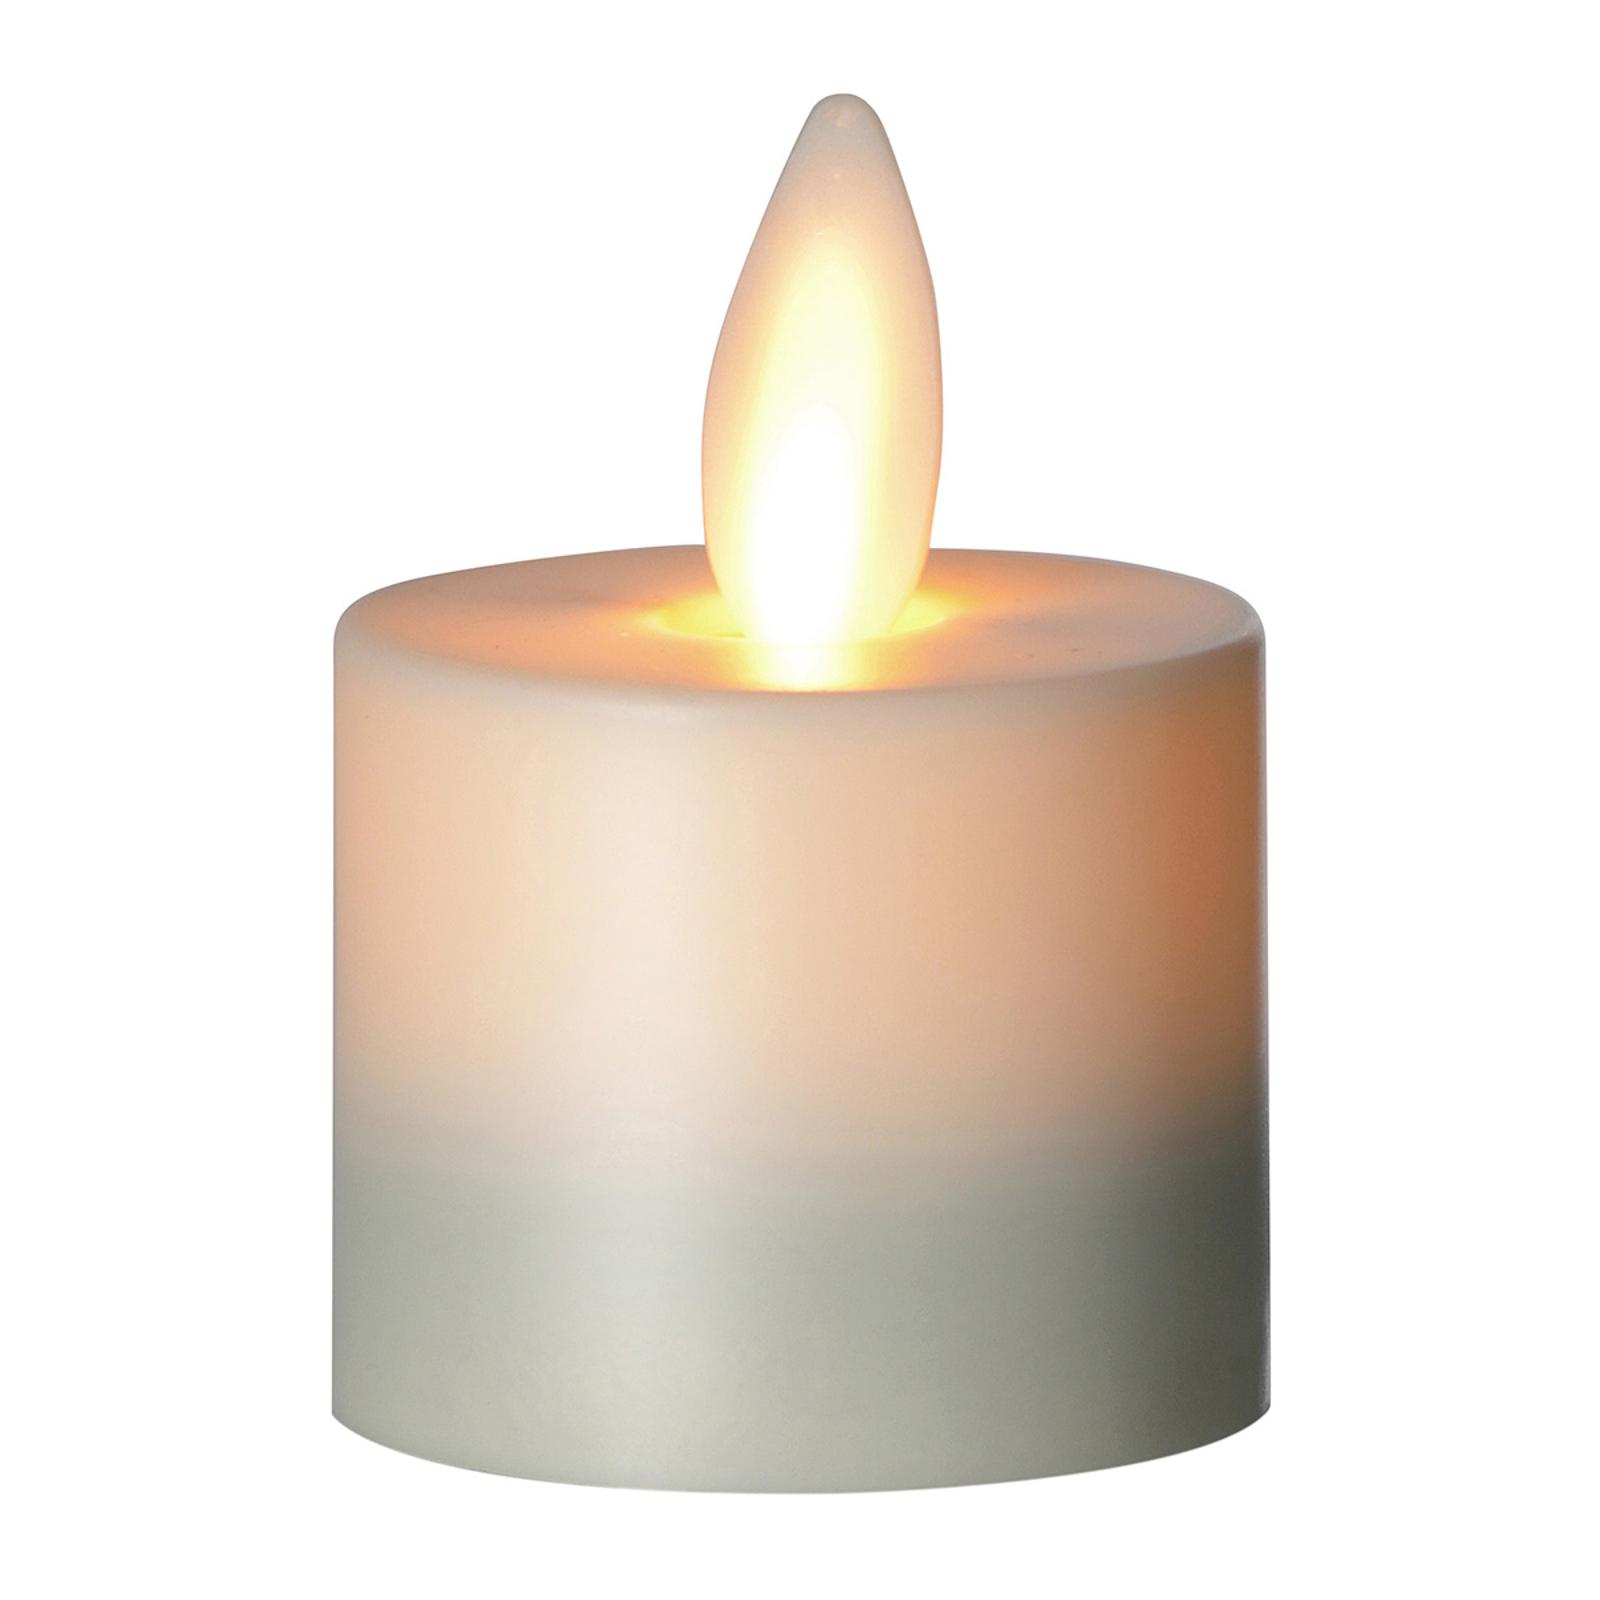 Bougie LED Flame bougie chauffe-plat, 3,1cm